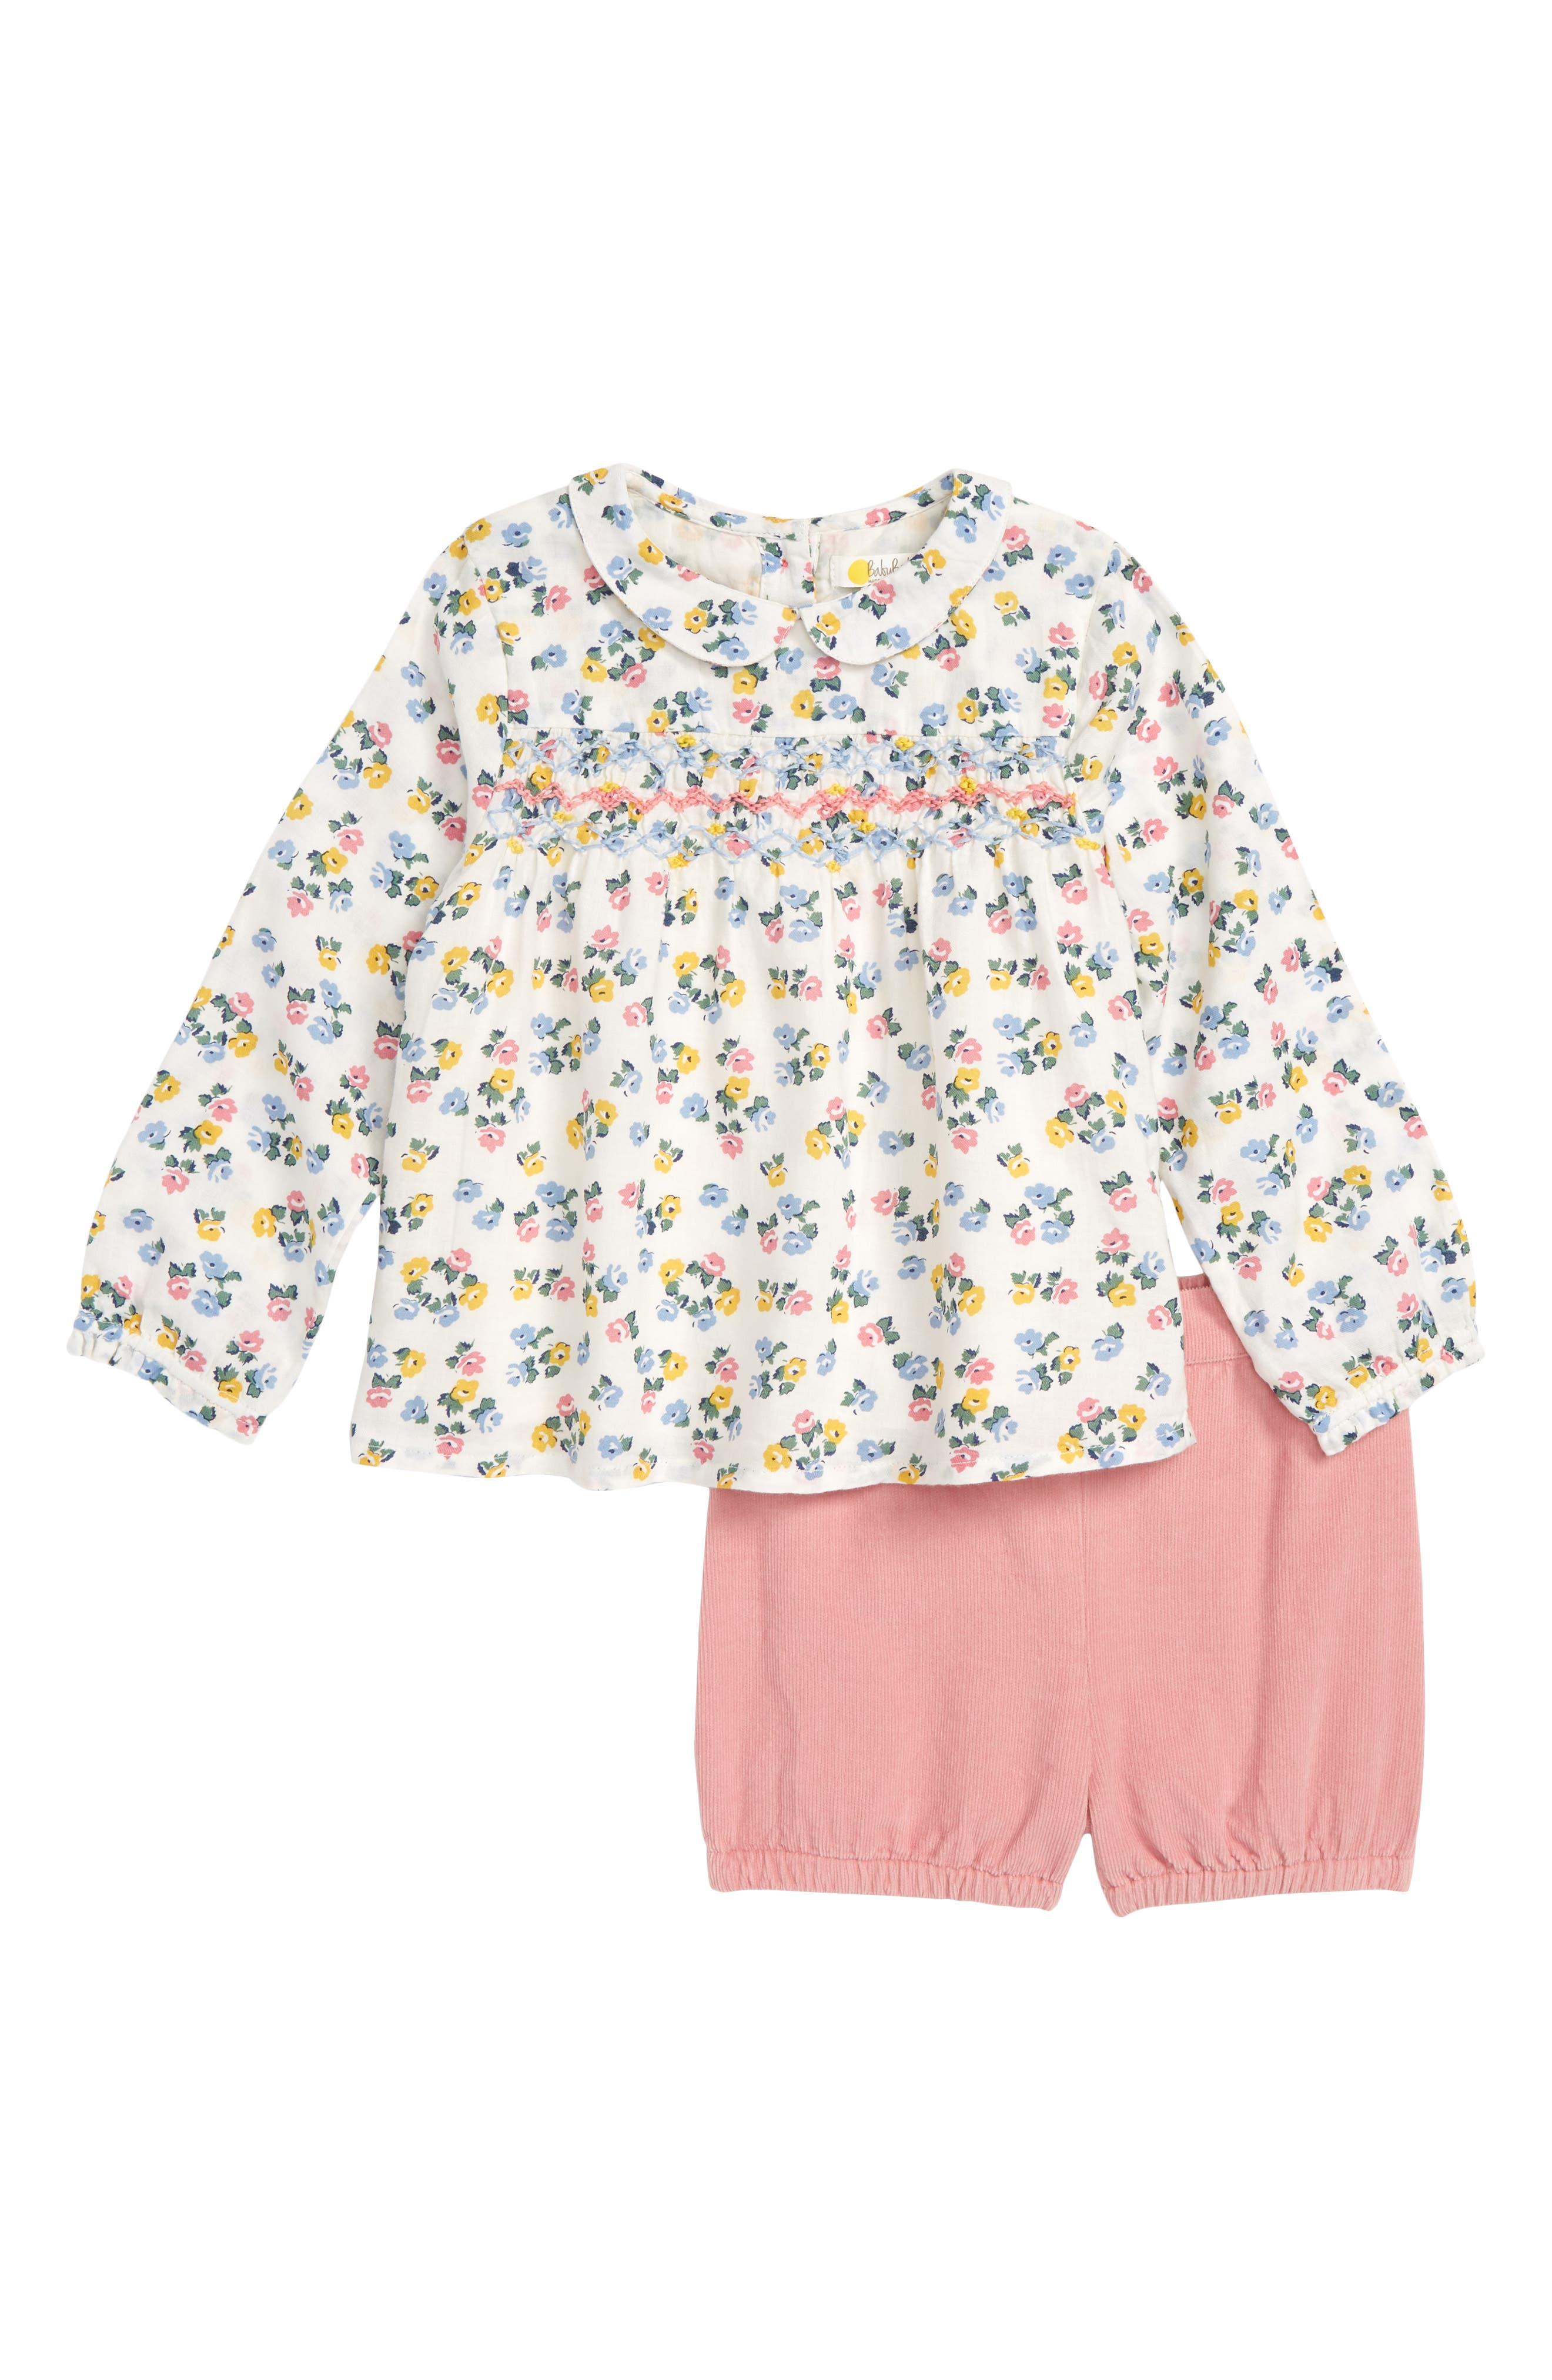 Toddler Girls Mini Boden Smock Woven Top  Shorts Set